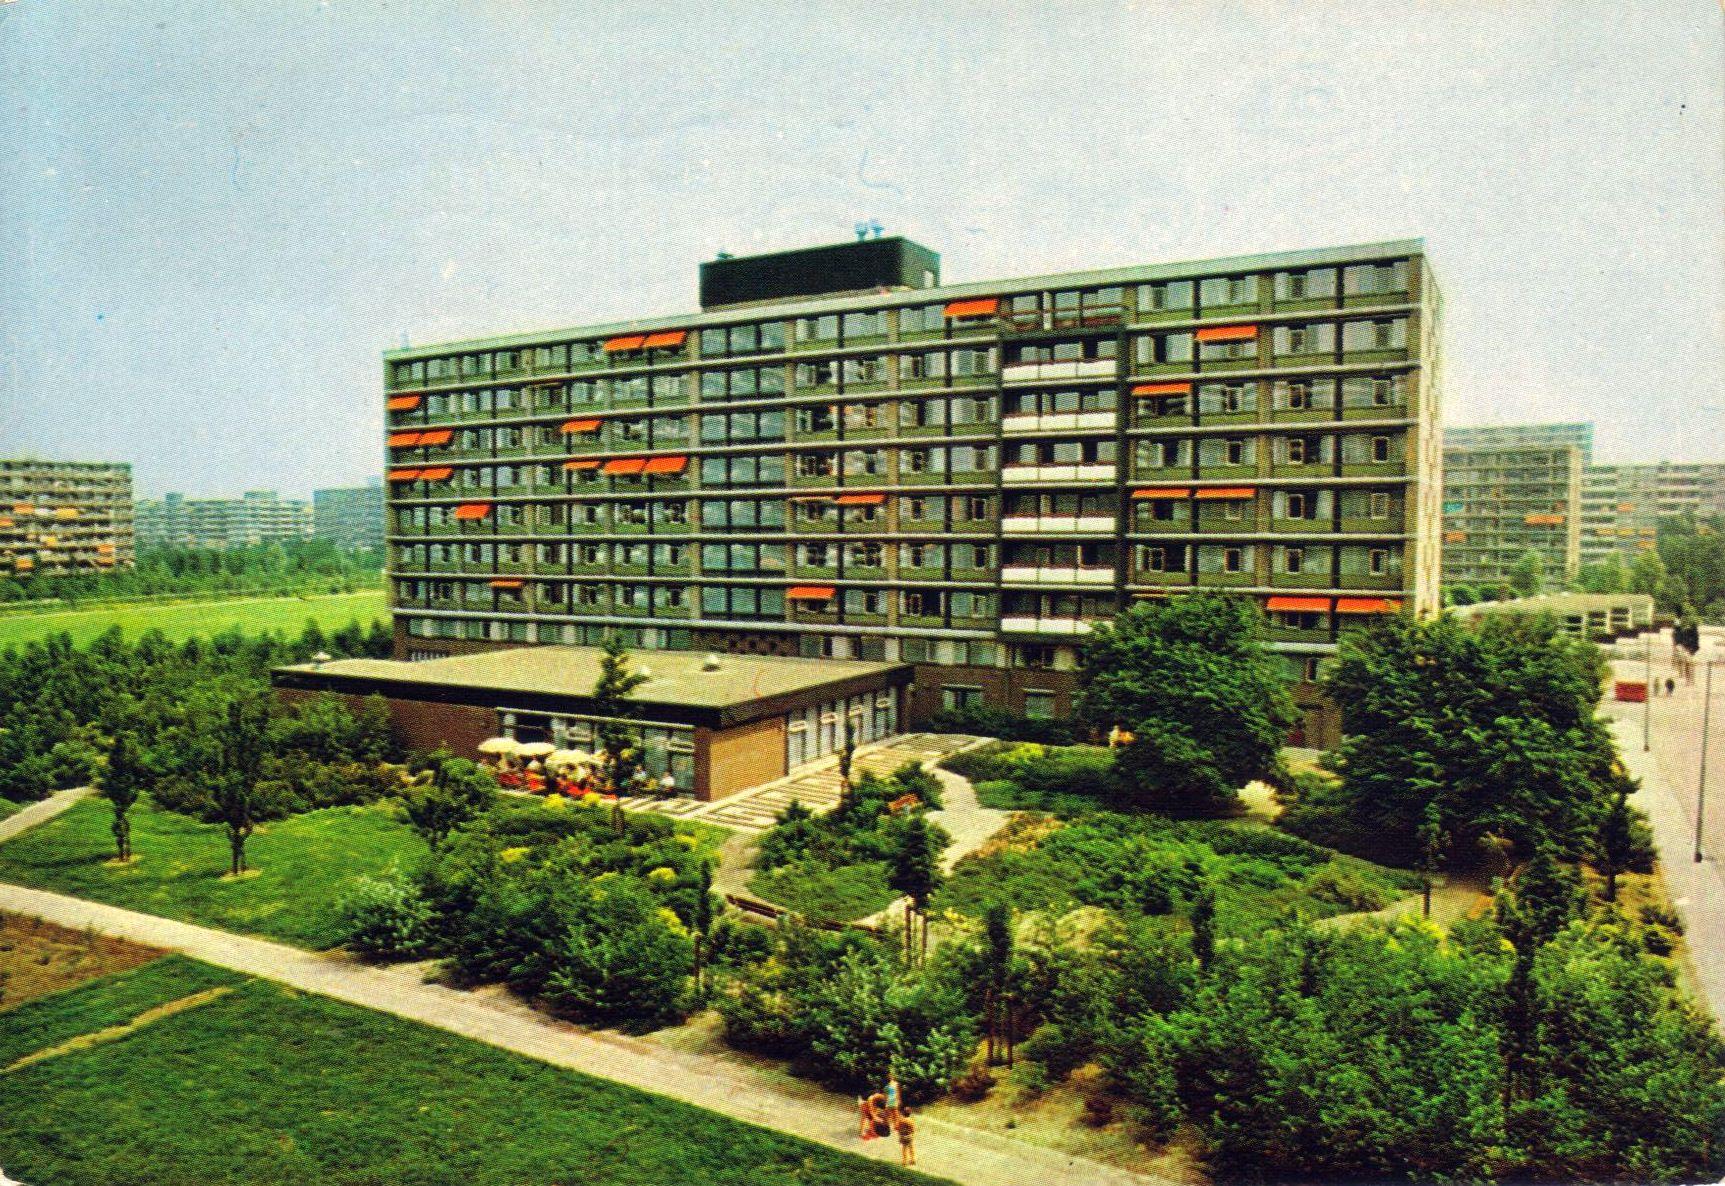 Prachtig wonen in rotterdam interveste infonet for Tijdelijk wonen